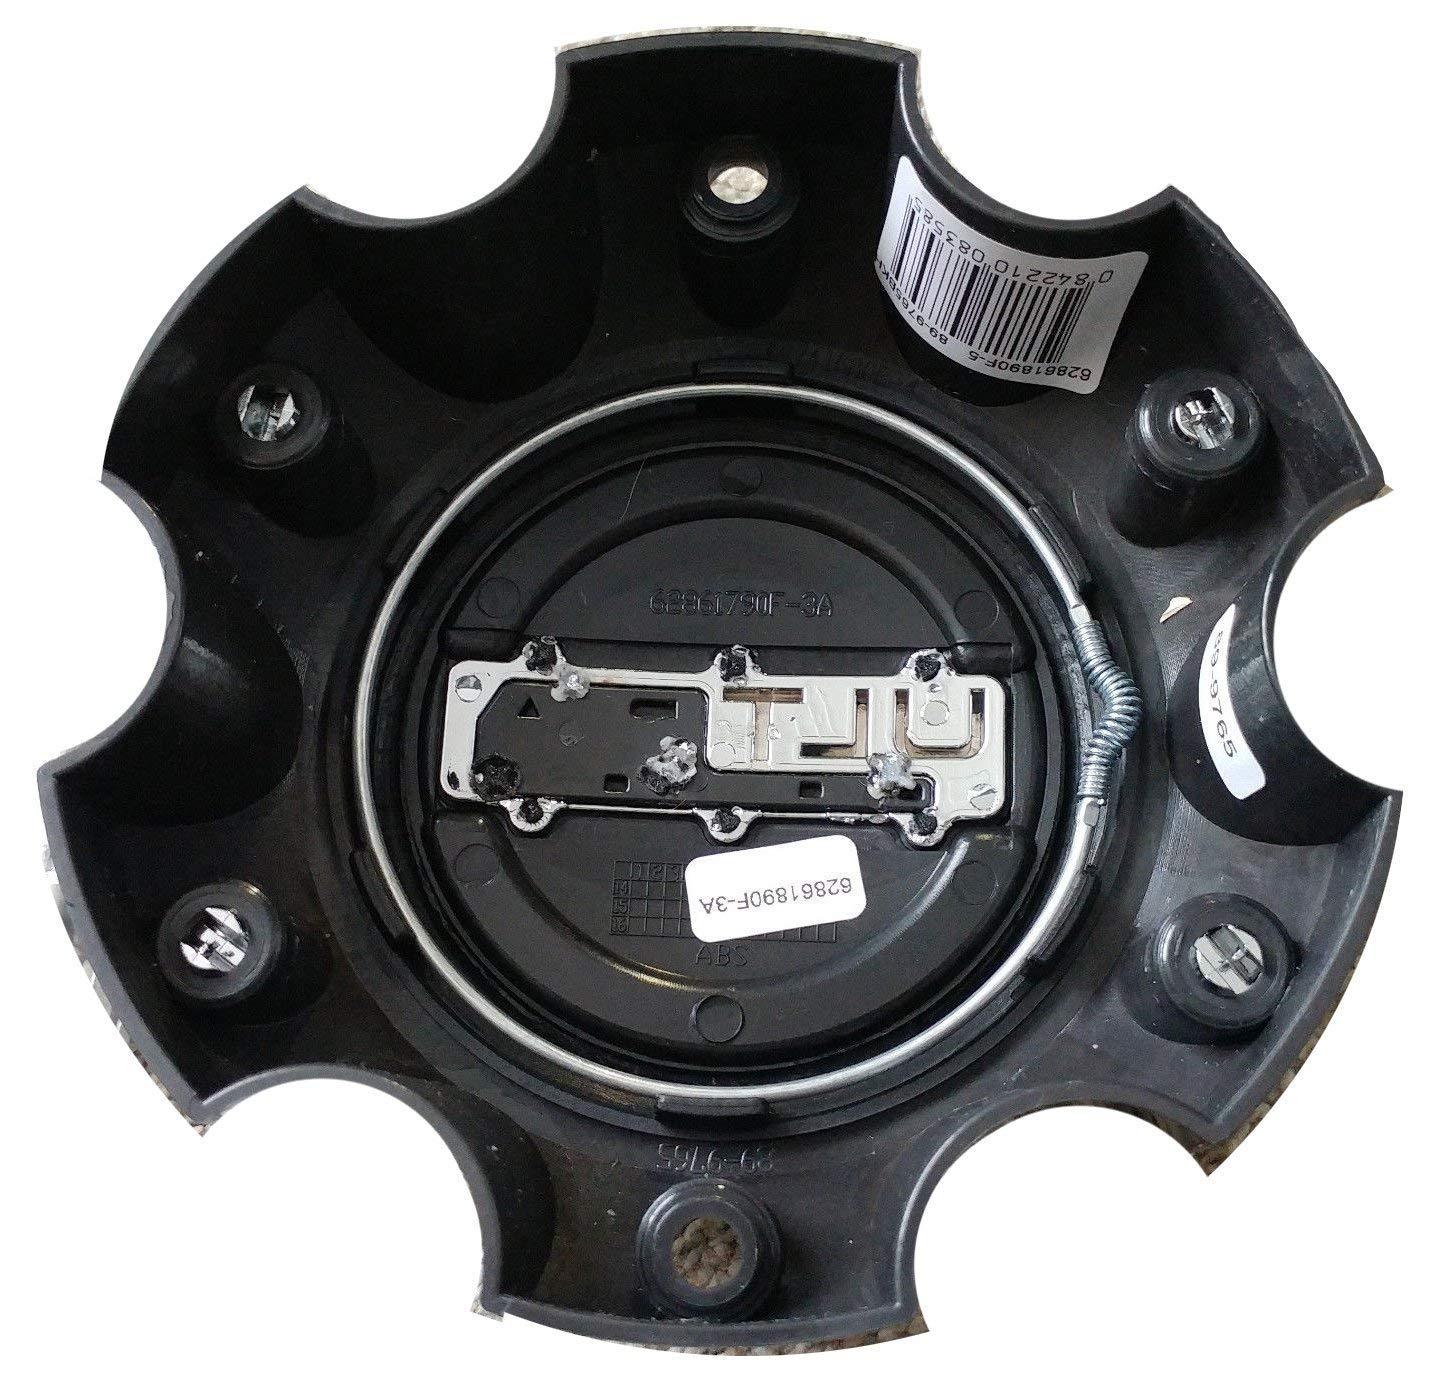 Ultra Motorsports 6 Lug Gloss Black Wheel Center Cap 89-9765BK Qty 1 Pn